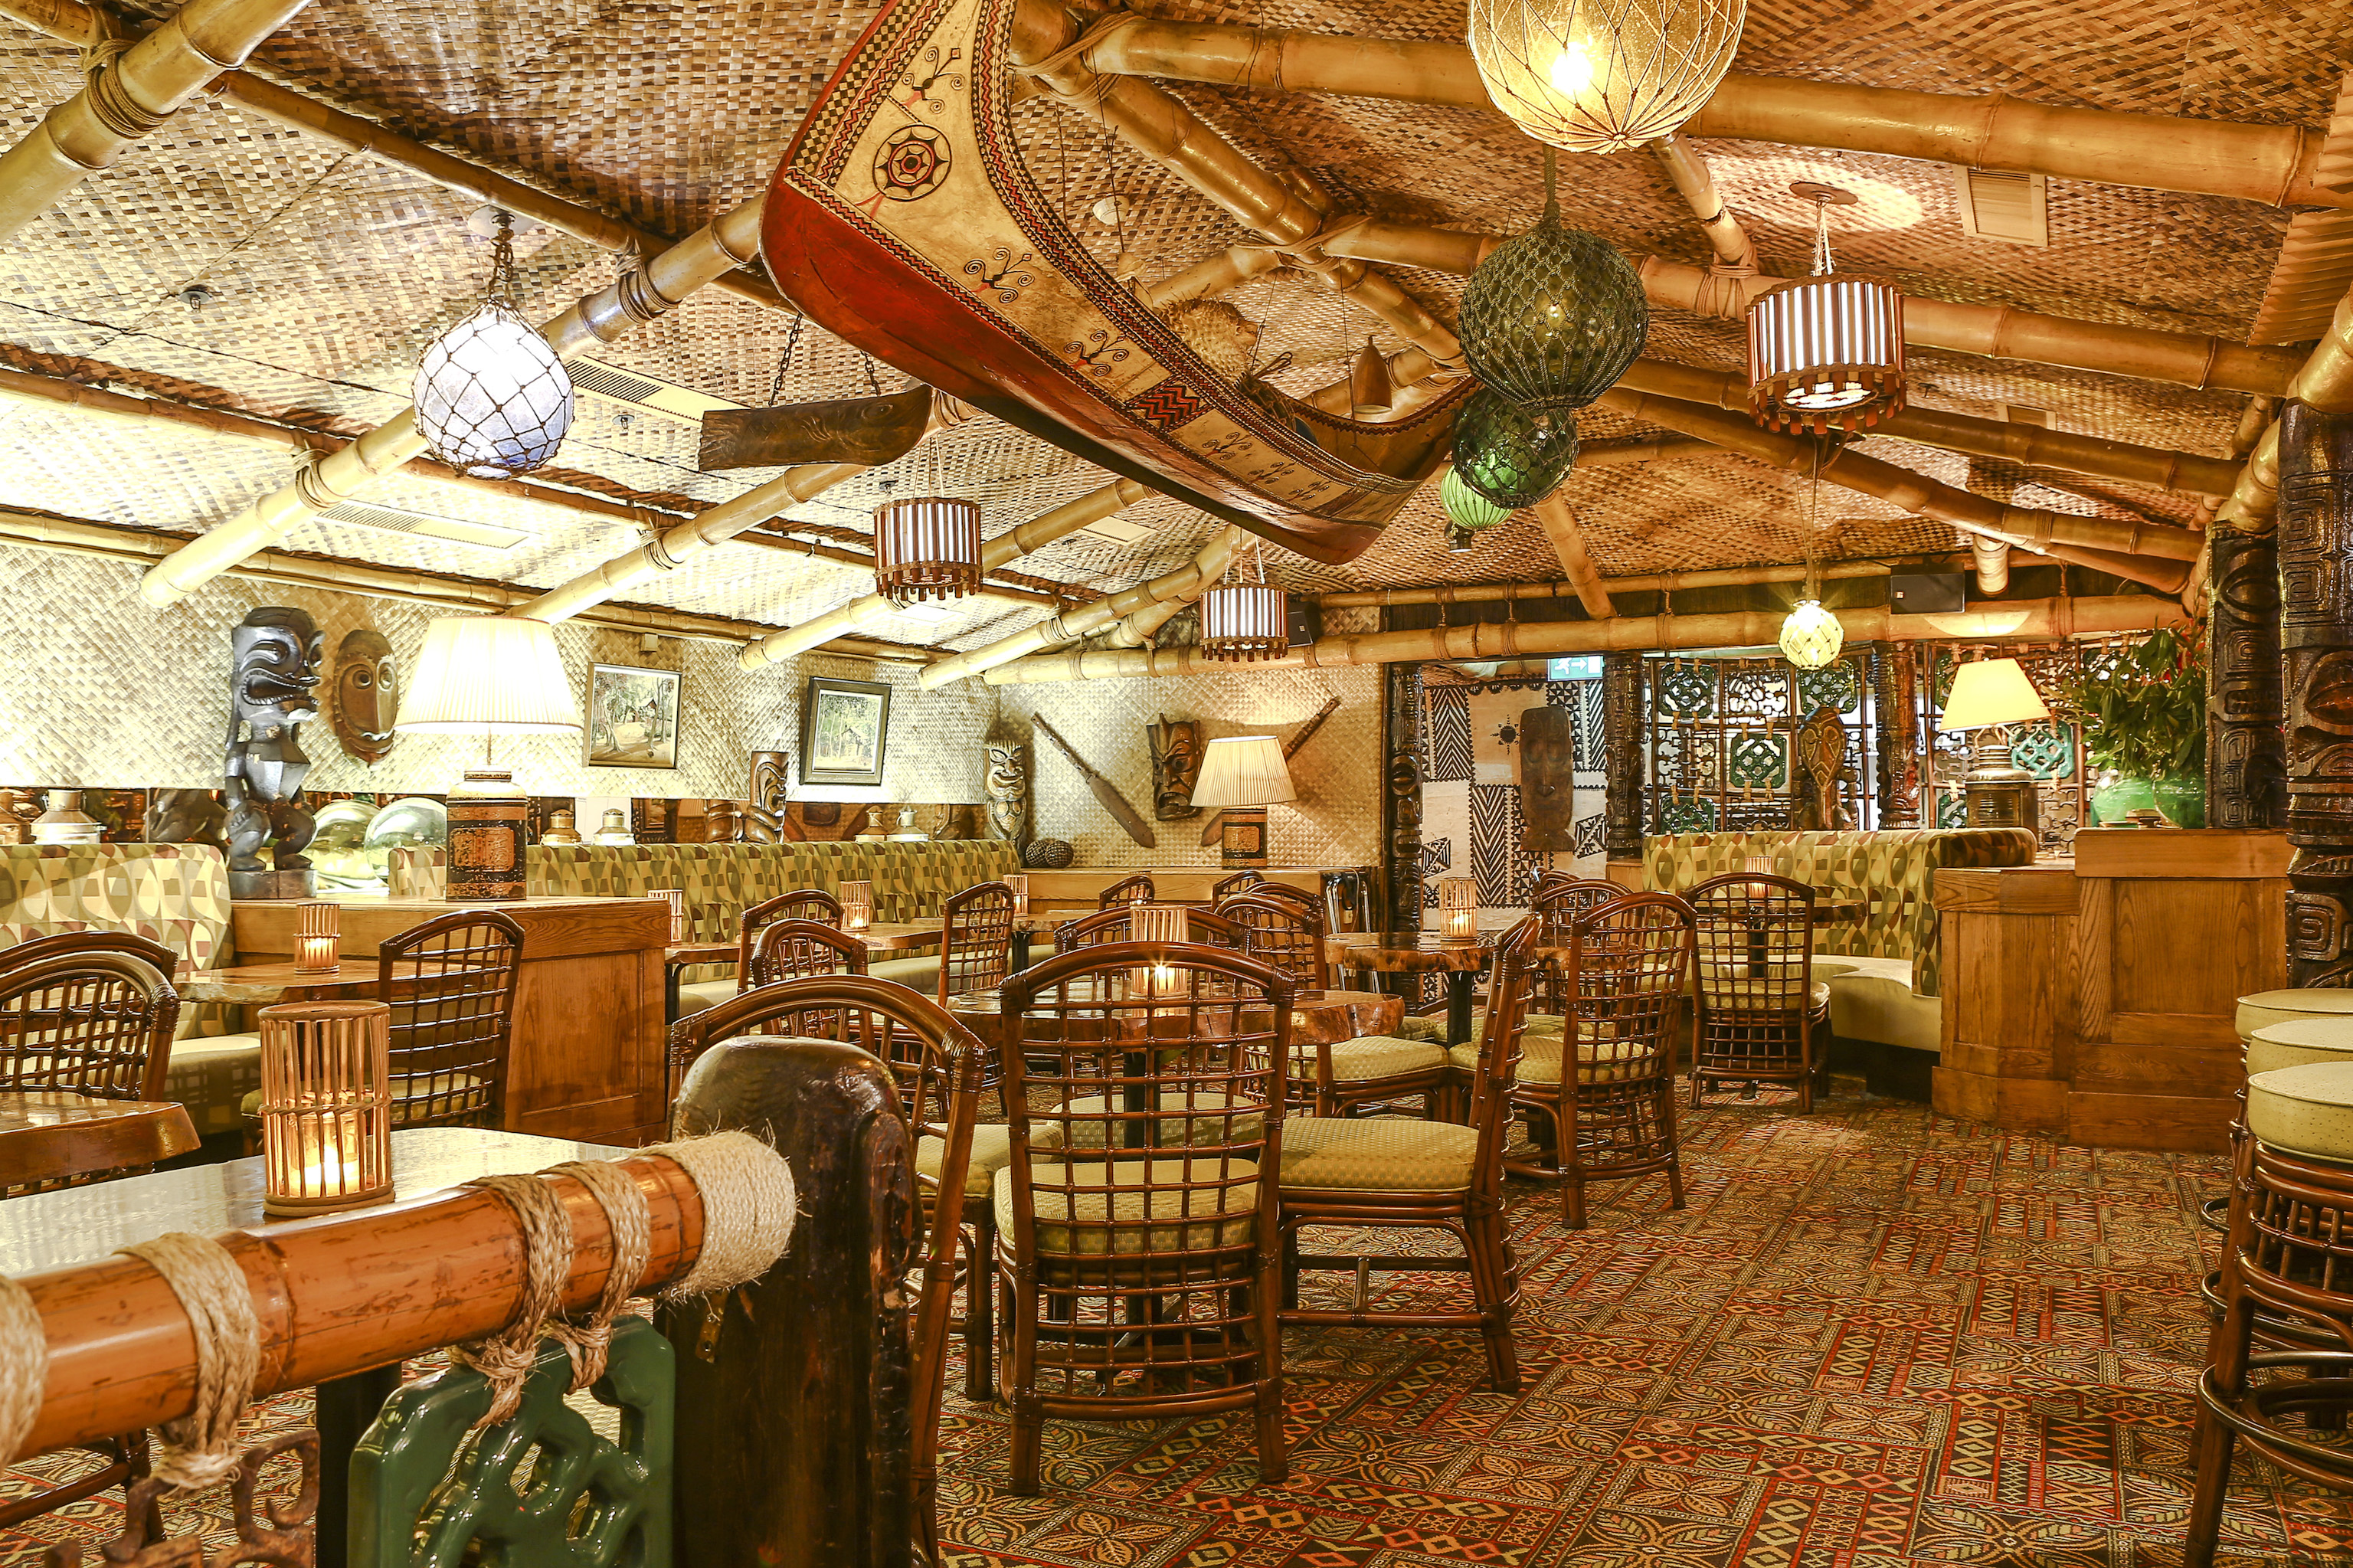 Bamboo Hut Restaurant Design